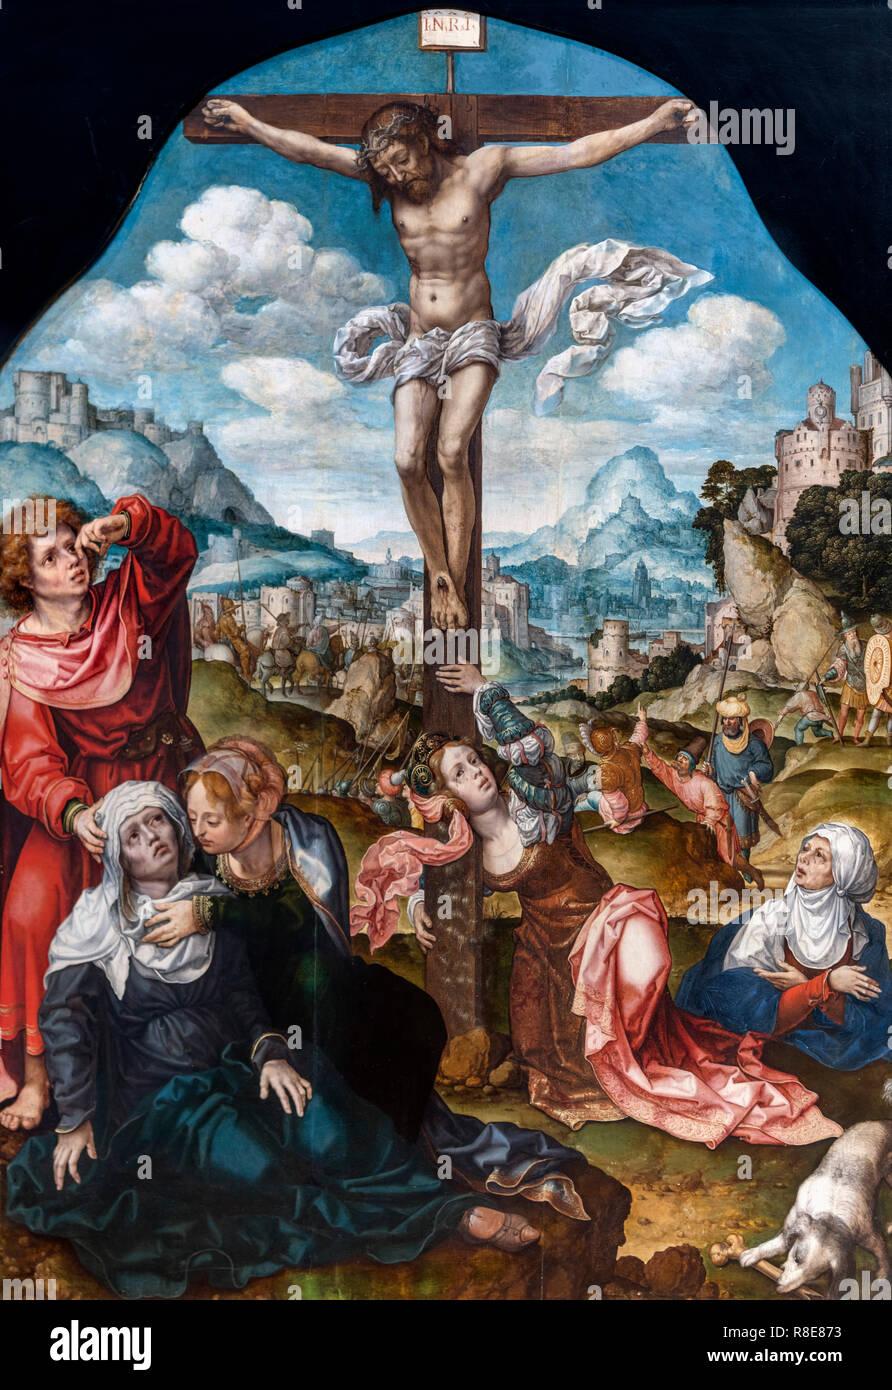 Crucifixion by Jan Gossaert (1478-1532), oil on oak panel - Stock Image